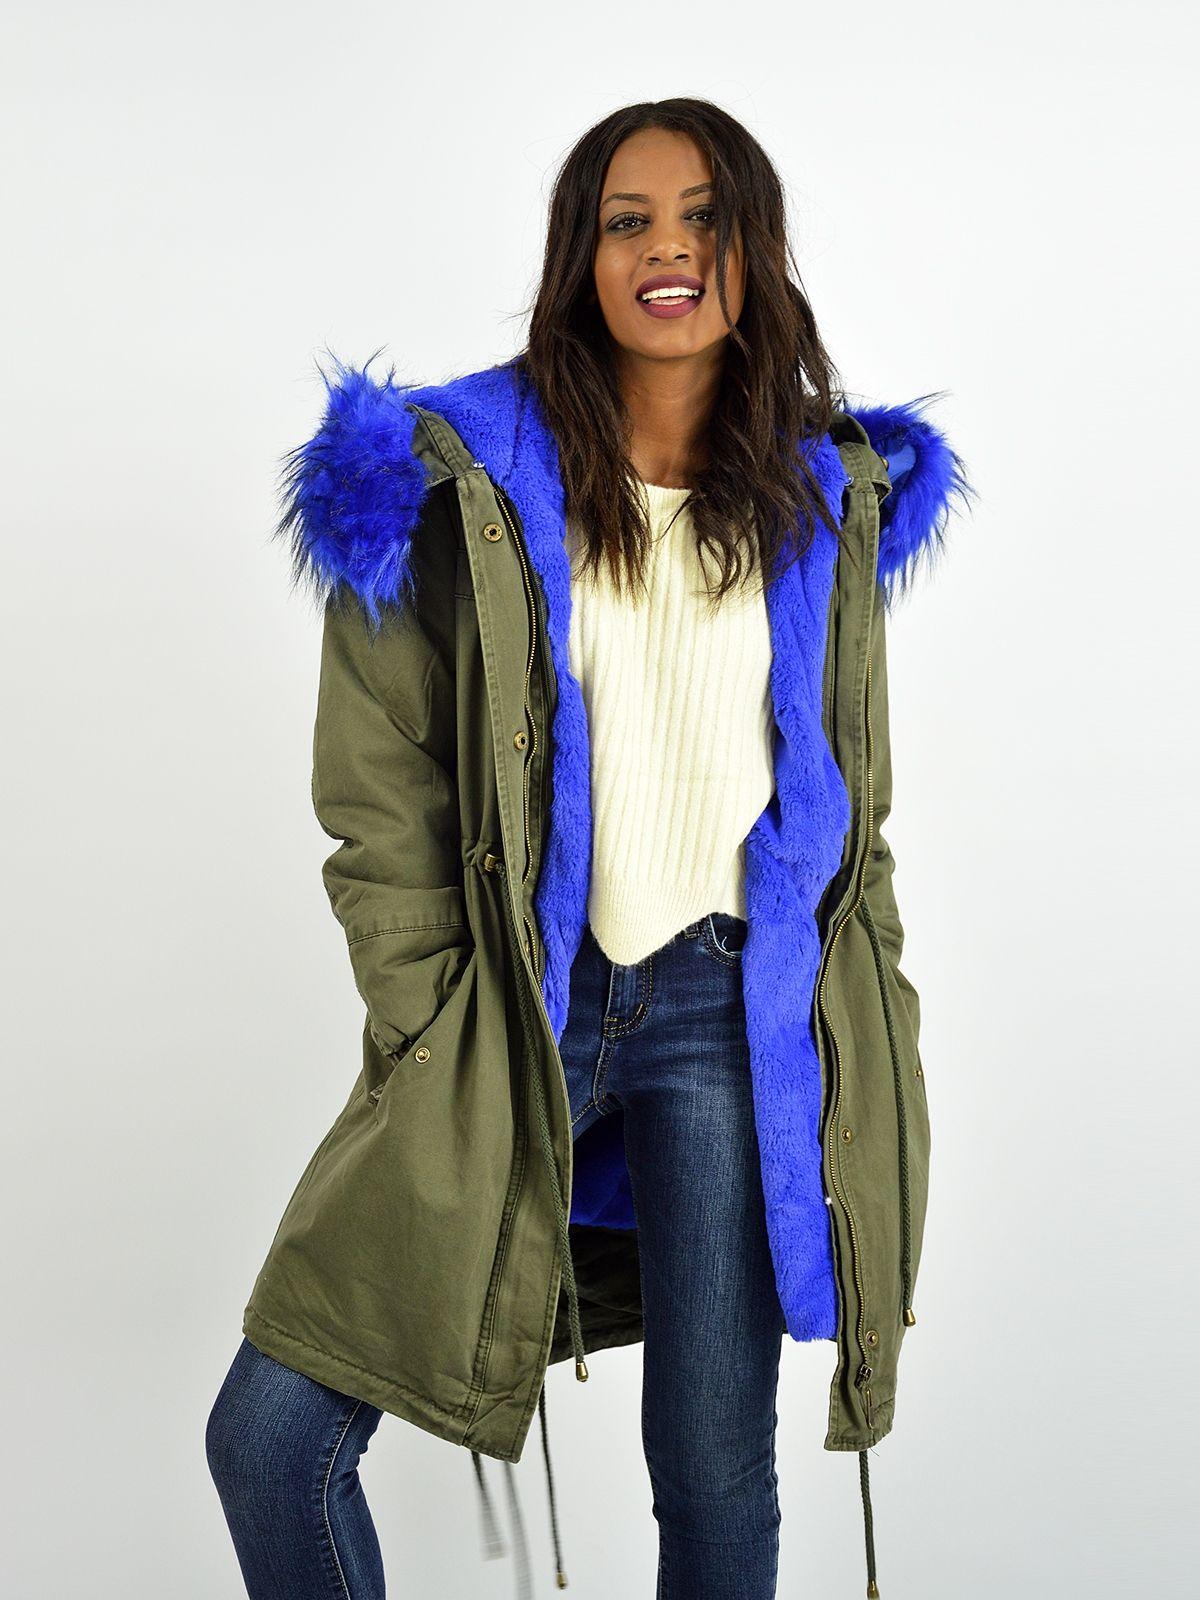 684a76253b24 D81068 Μπουφάν Παρκά με Αποσπώμενη Επένδυση Γούνας - Decoro - Γυναικεία  ρούχα